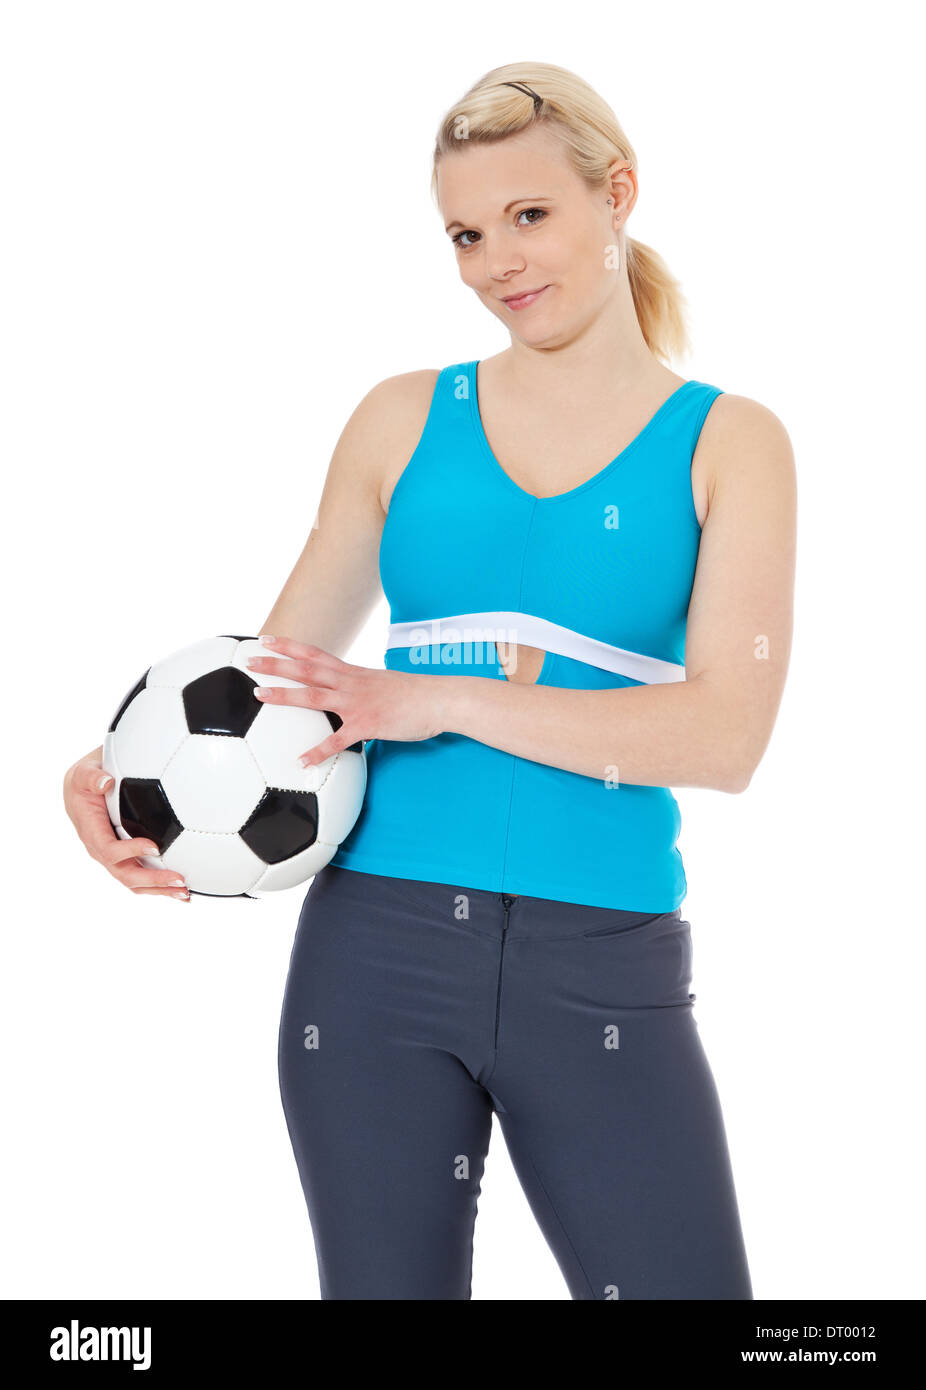 18f914d7d74e3 Atractiva mujer joven sosteniendo un balón de fútbol. Todo sobre fondo  blanco. Imagen De